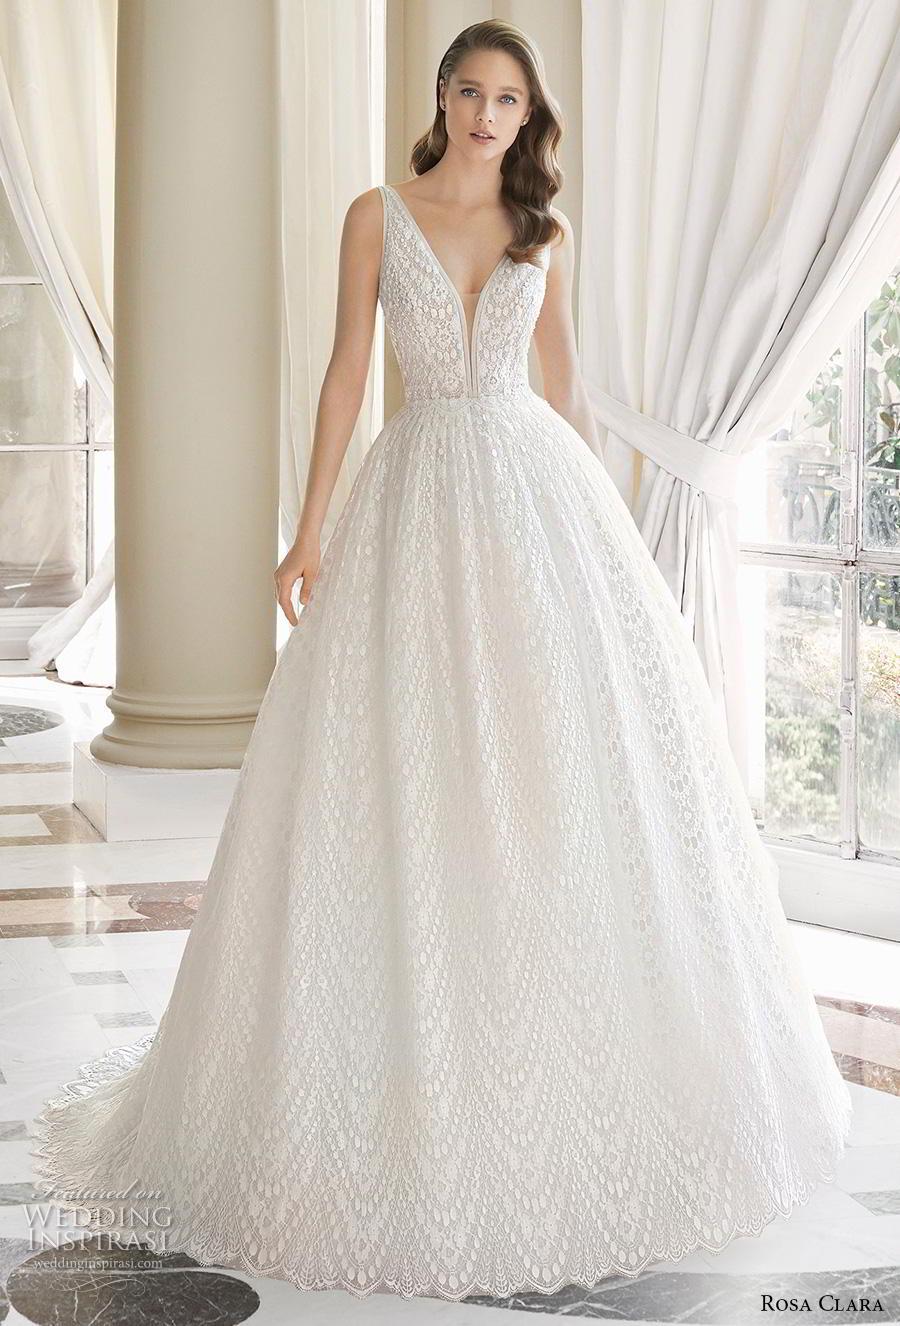 rosa clara 2019 couture bridal sleeveless deep v neck full embellishment romantic ball gown a  line wedding dress v back sweep train (9) mv